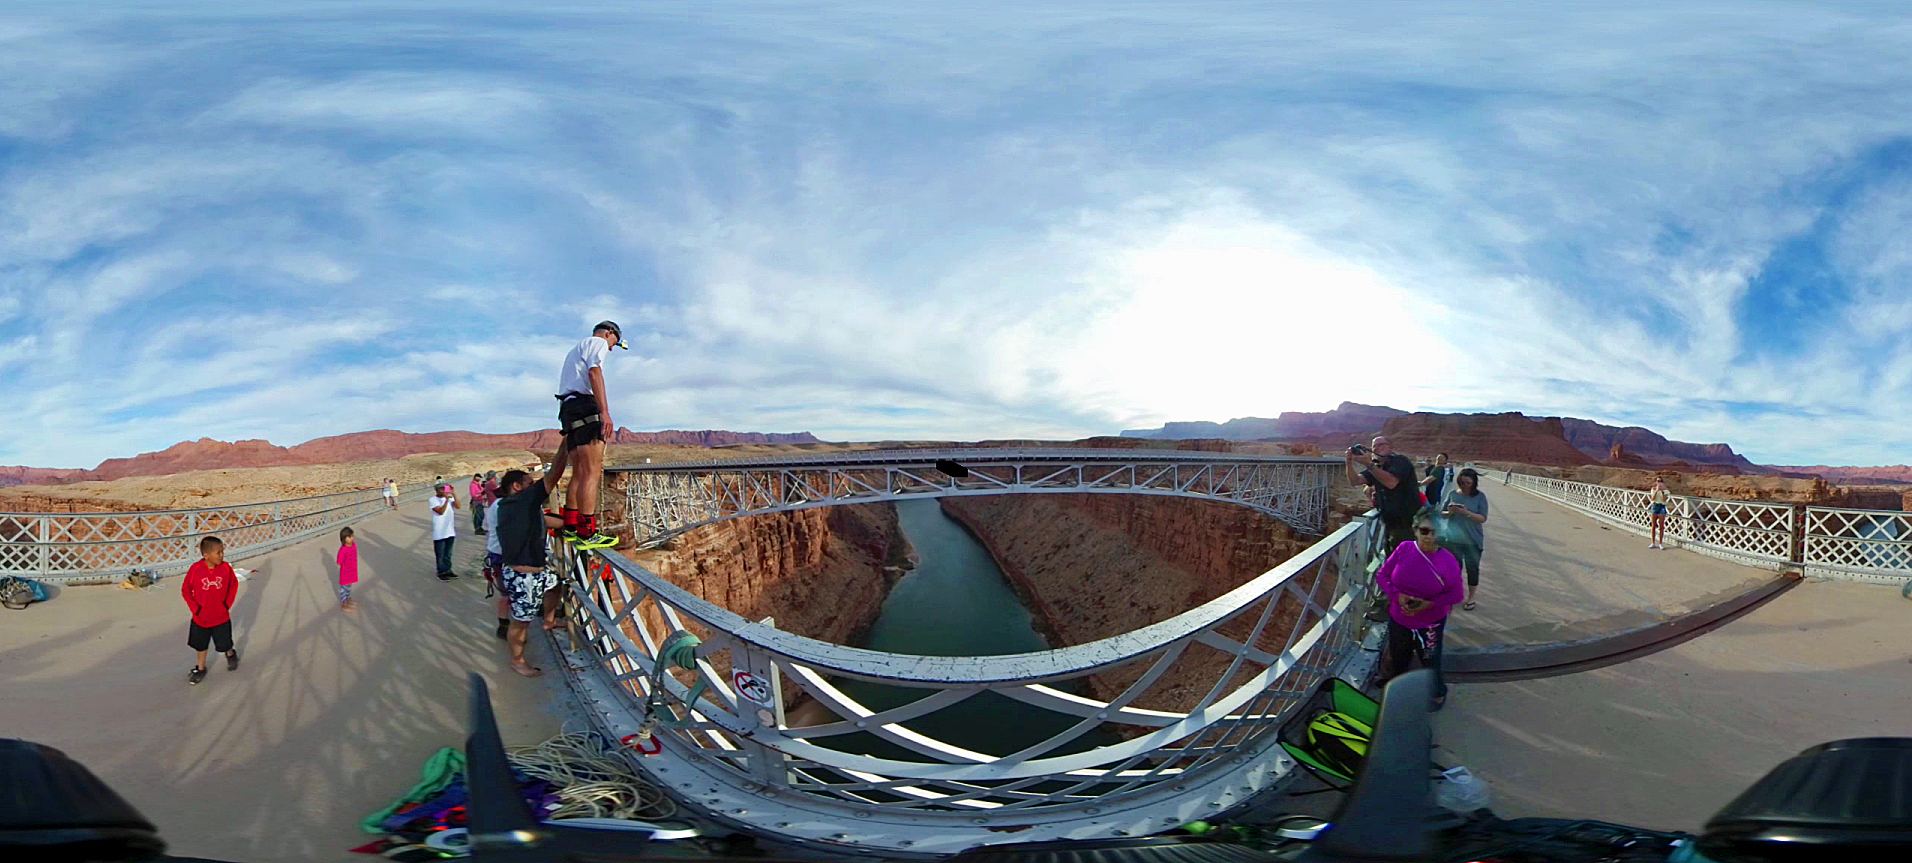 Navajo Bridge Bungee Jump - Grand Canyon - Arizona. Snapshot from my Samsung 360 (video).